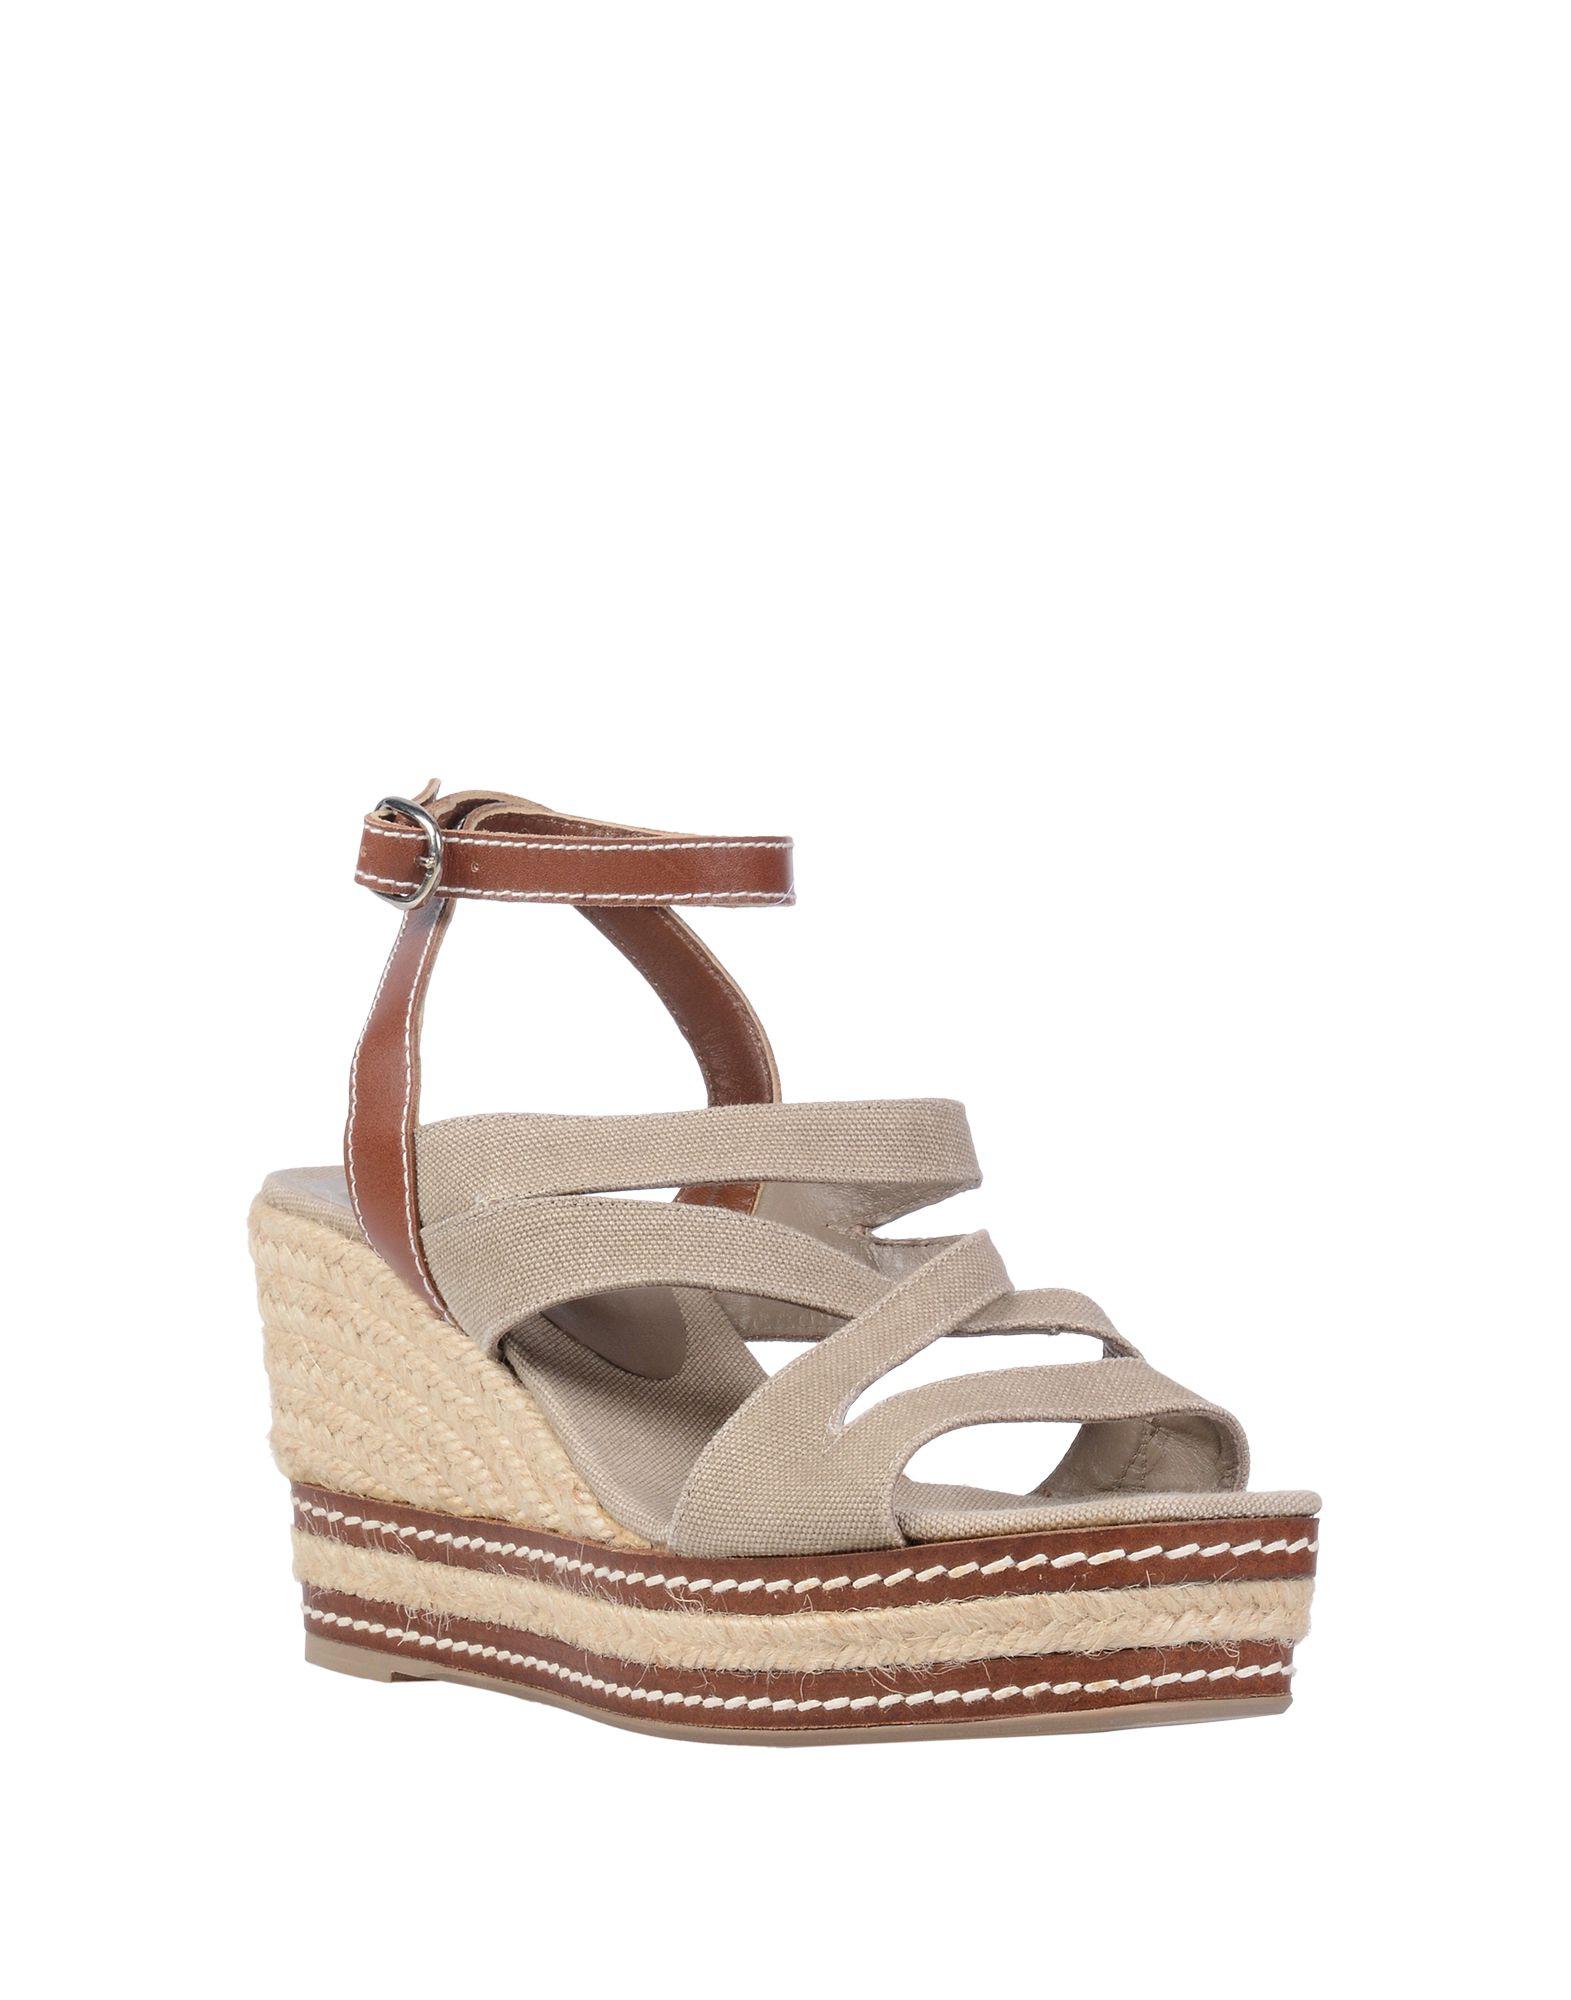 Castañer Sandals - Women Castañer Sandals Sandals Sandals online on  United Kingdom - 11522565VH c7c8fa